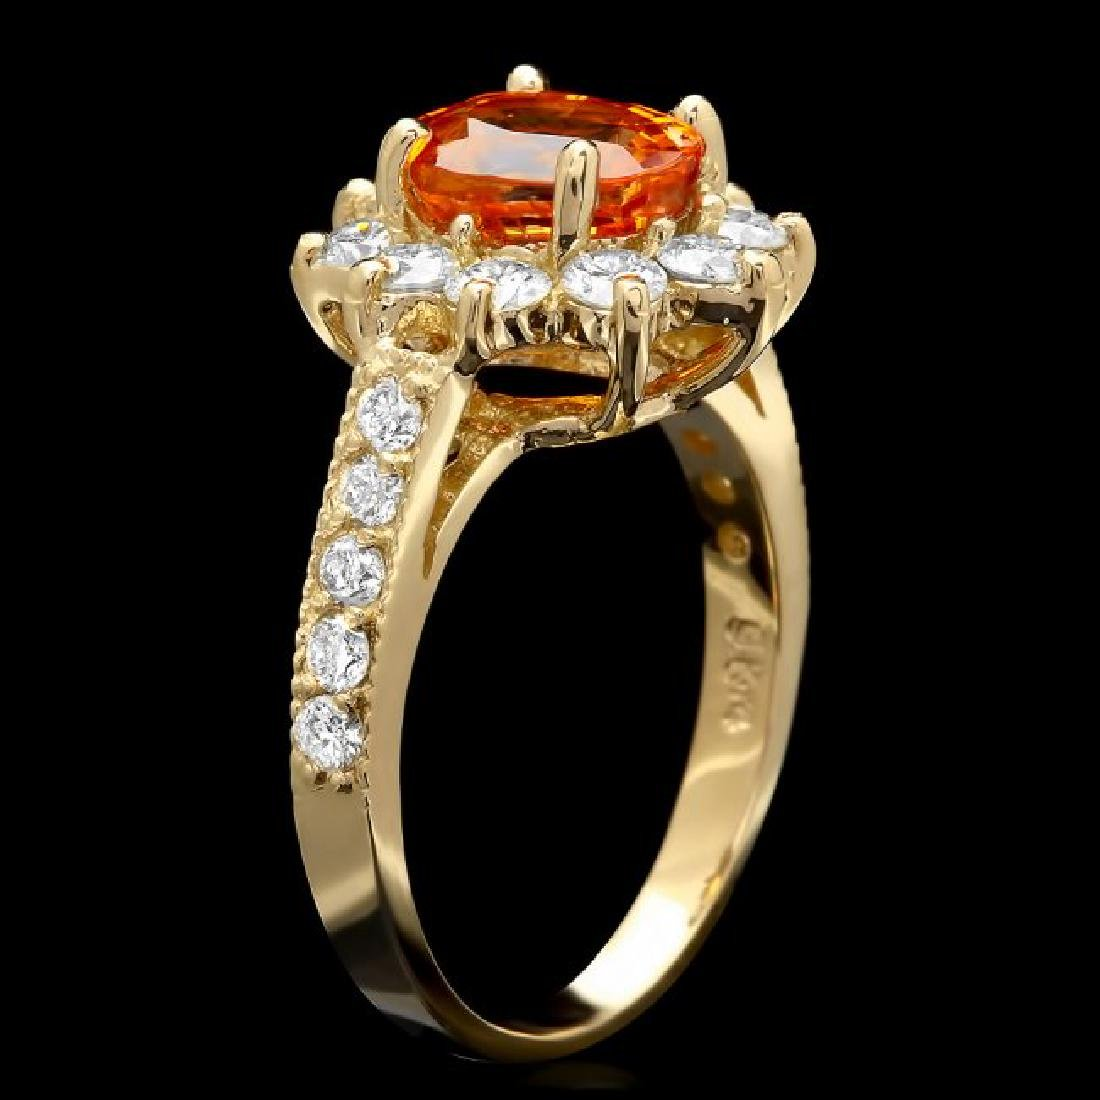 14k Yellow Gold 2.40ct Garnet 1ct Diamond Ring - 2